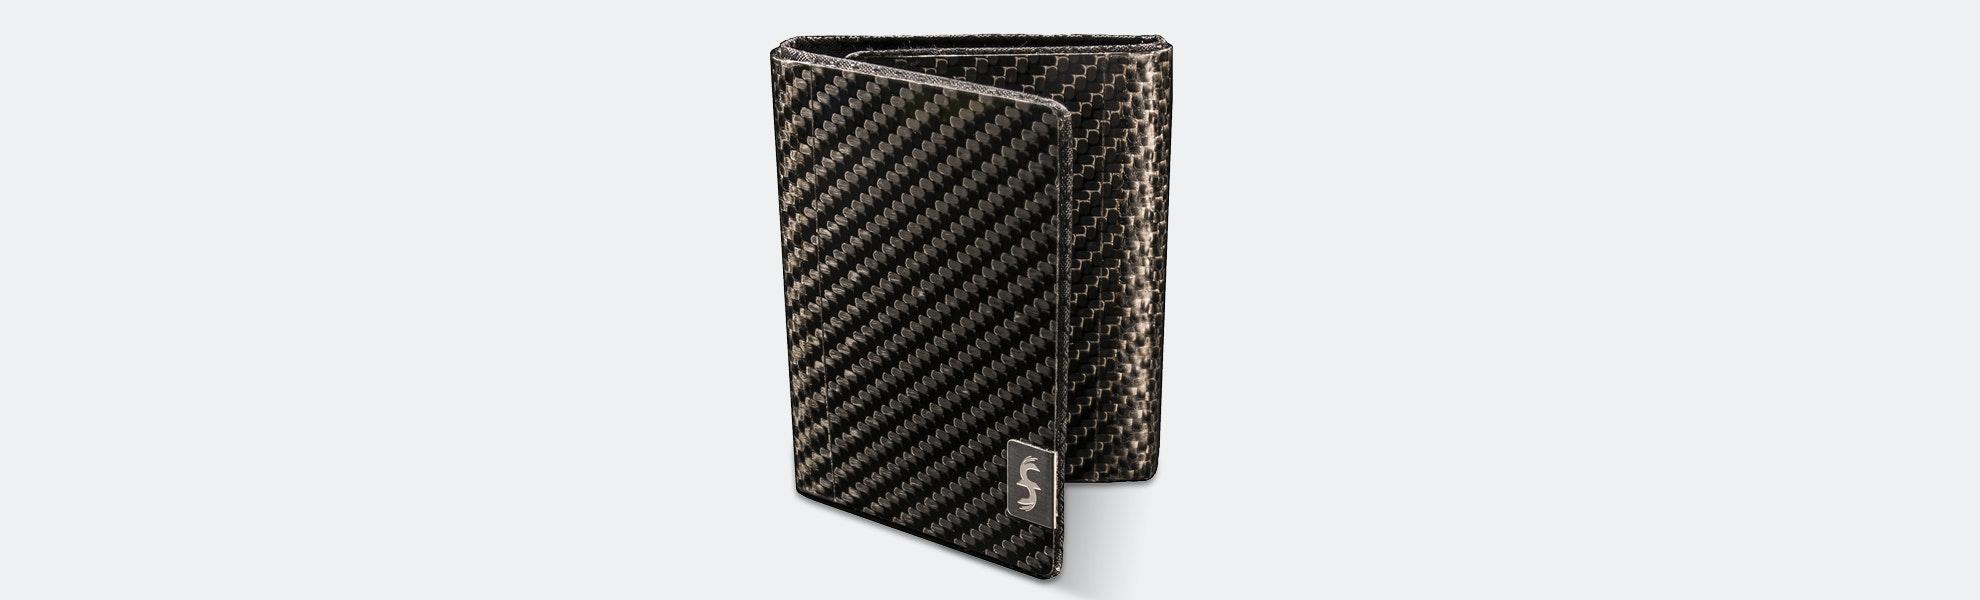 Common Fibers TRI Trifold Wallet